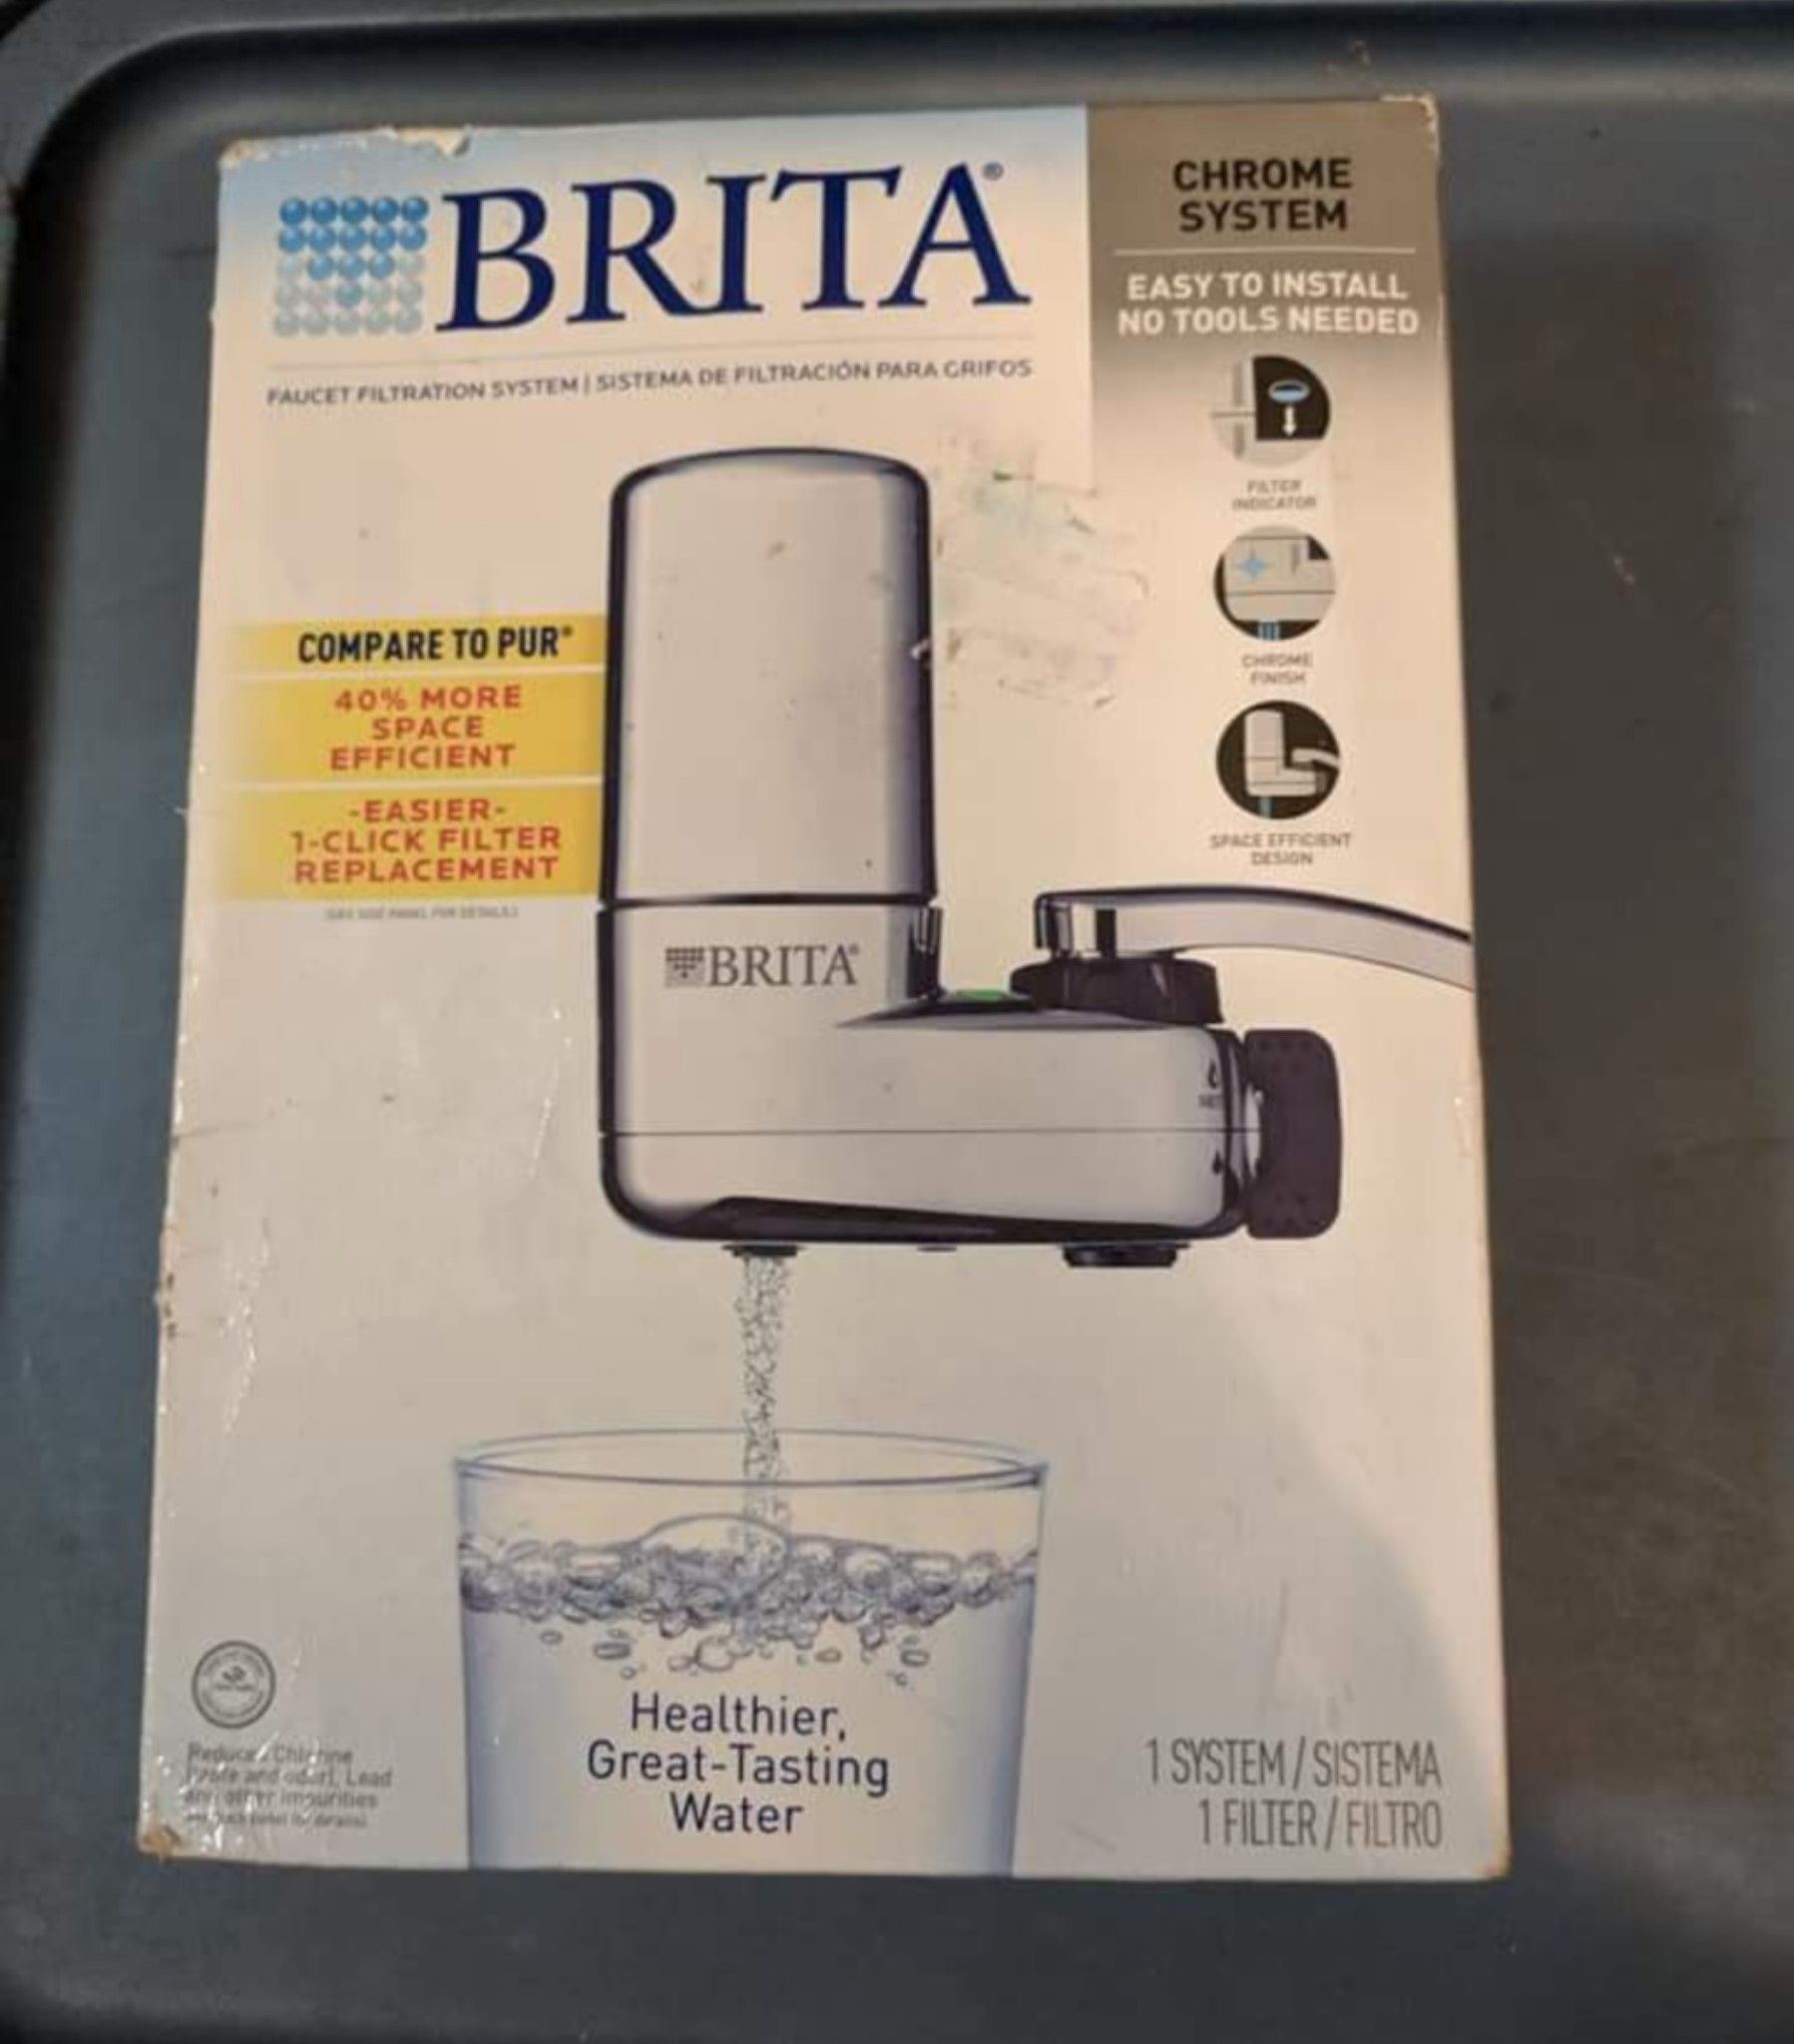 Brita Faucet Filtration System Chrome Finish